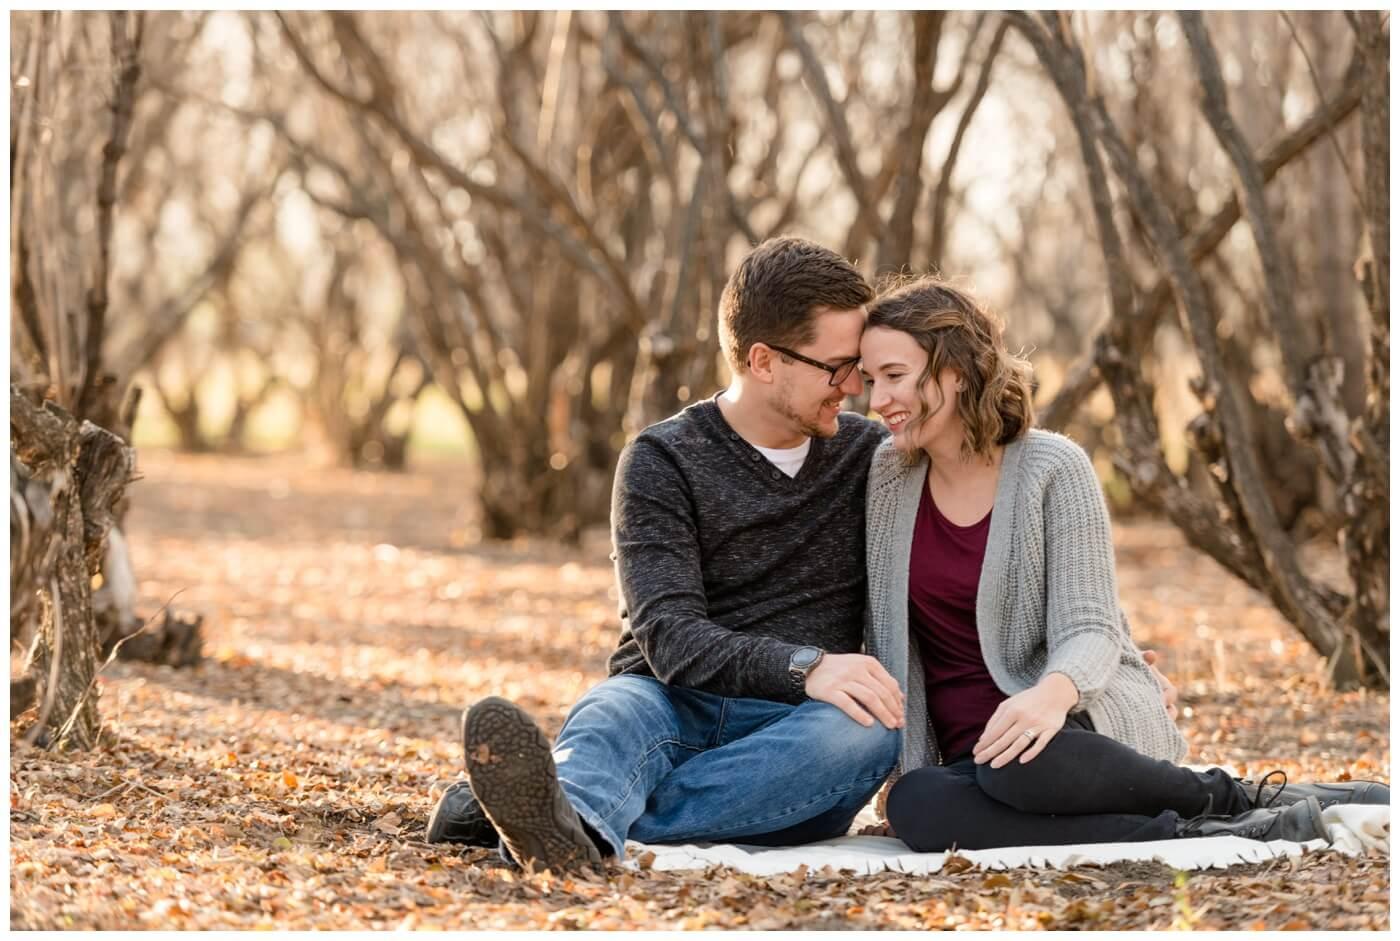 Regina Family Photography - Teala-Jarrett - Fall Family Session - Les Sherman Park - Sitting in Trees